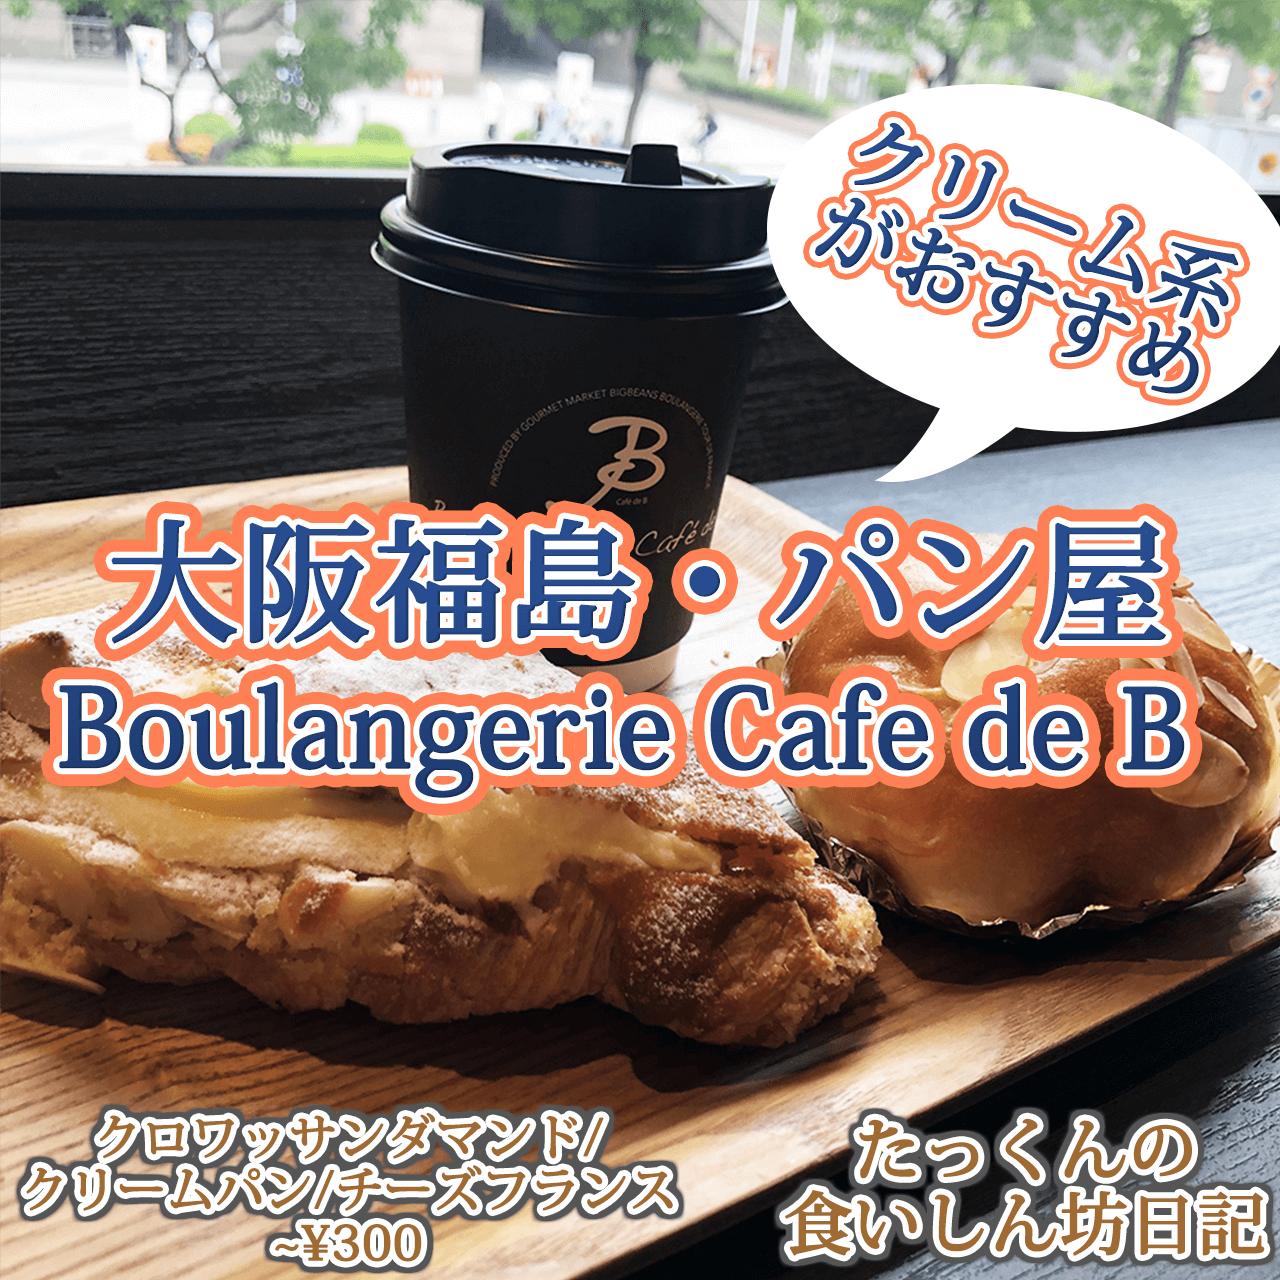 Boulangerie Cafe de Bアイキャッチ